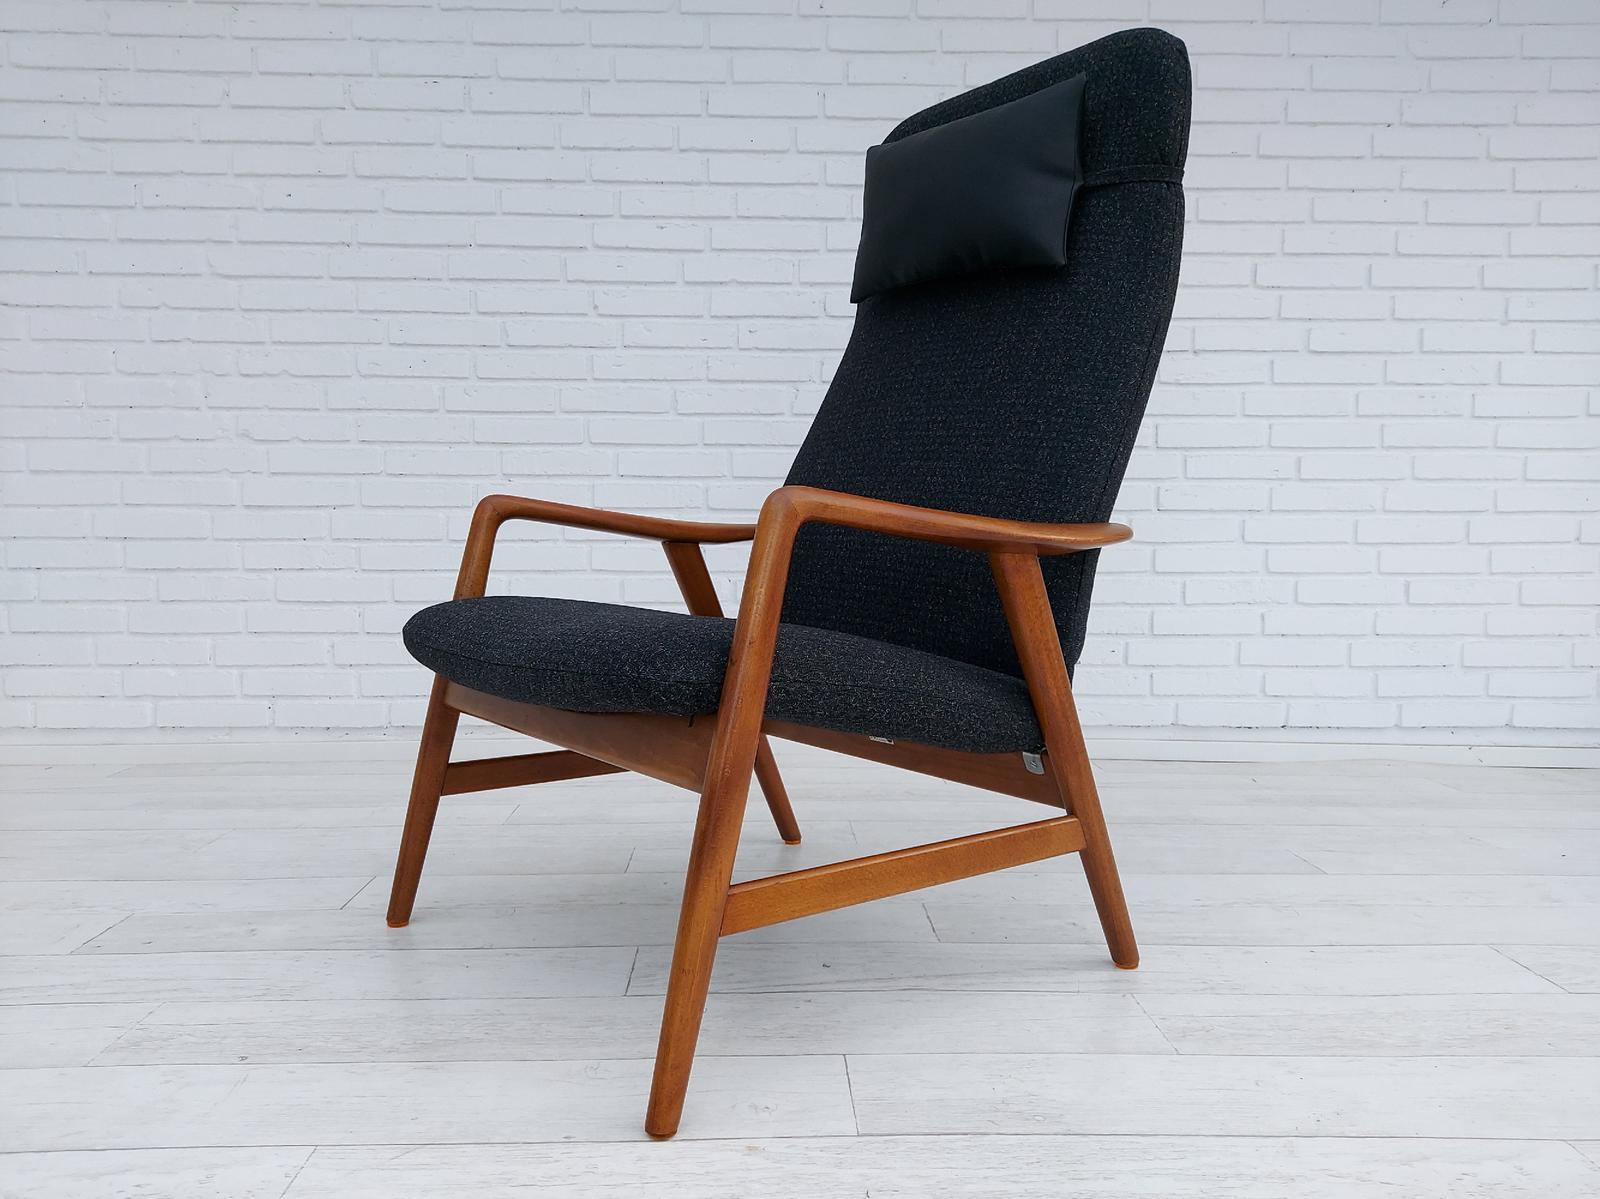 Retro Møbler Galleri image (1 of 12)